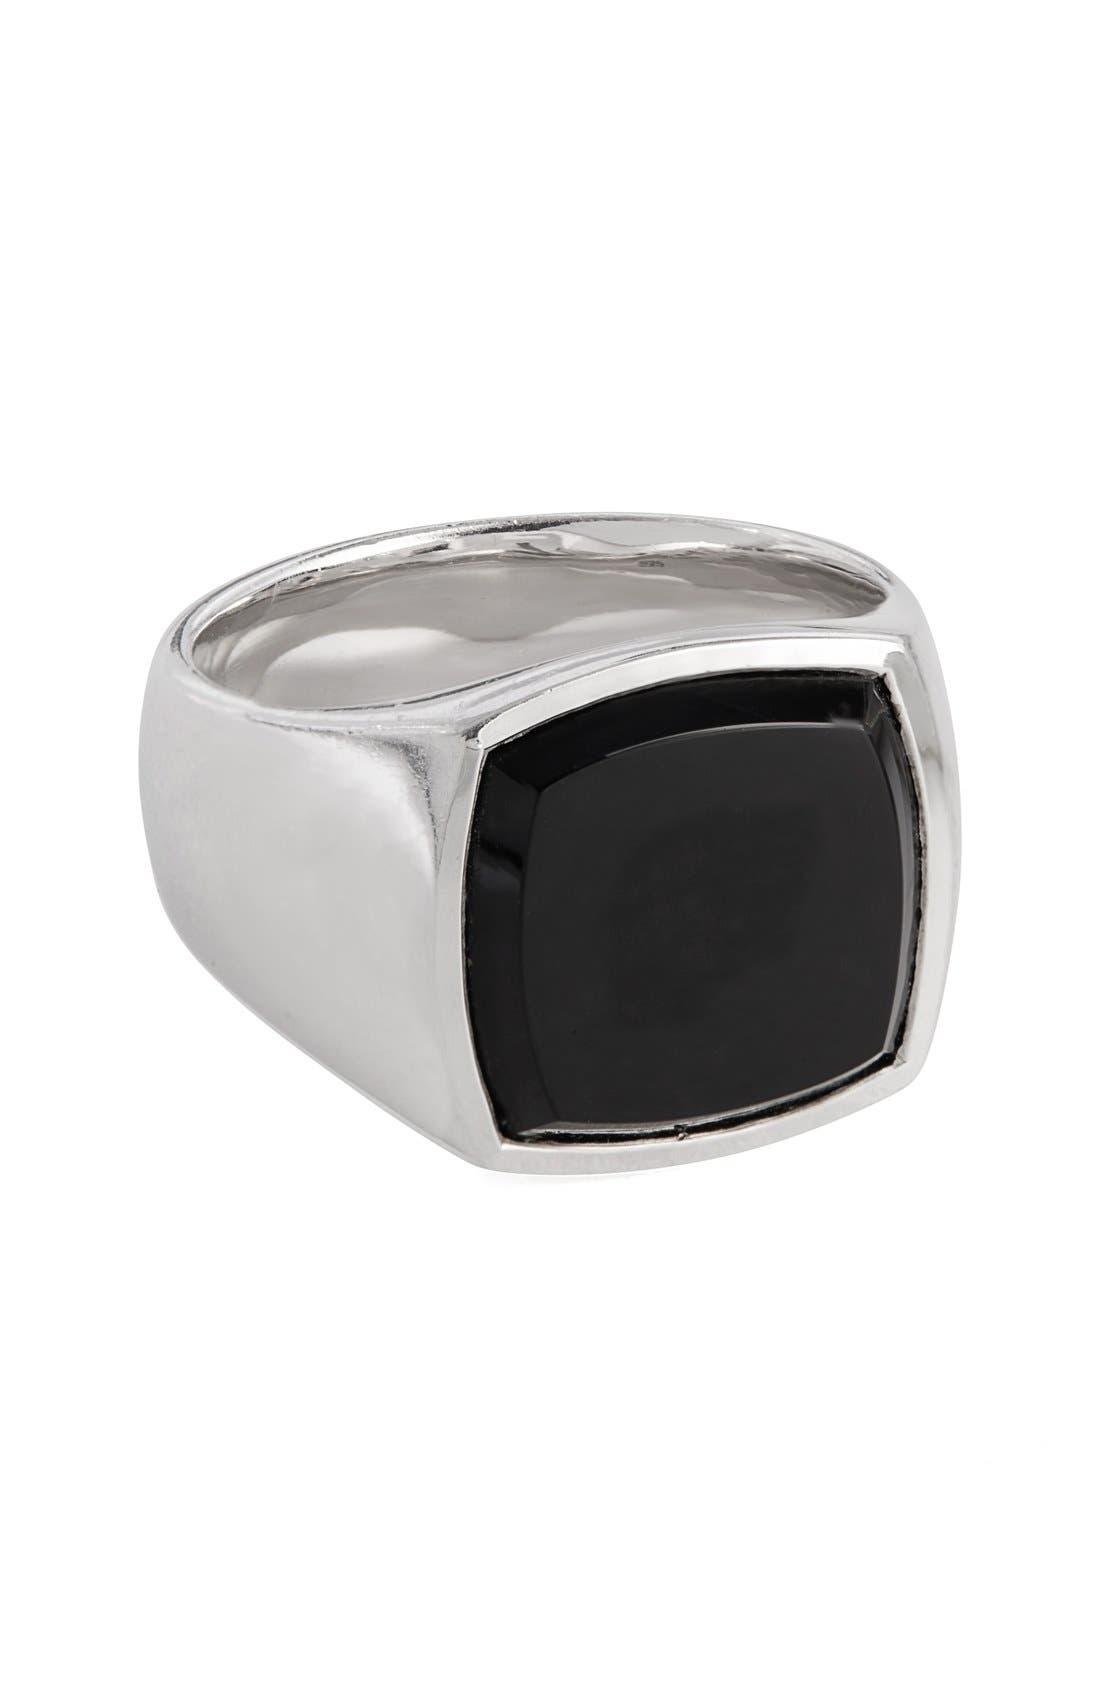 Black Onyx Cushion Signet Ring,                             Main thumbnail 1, color,                             041